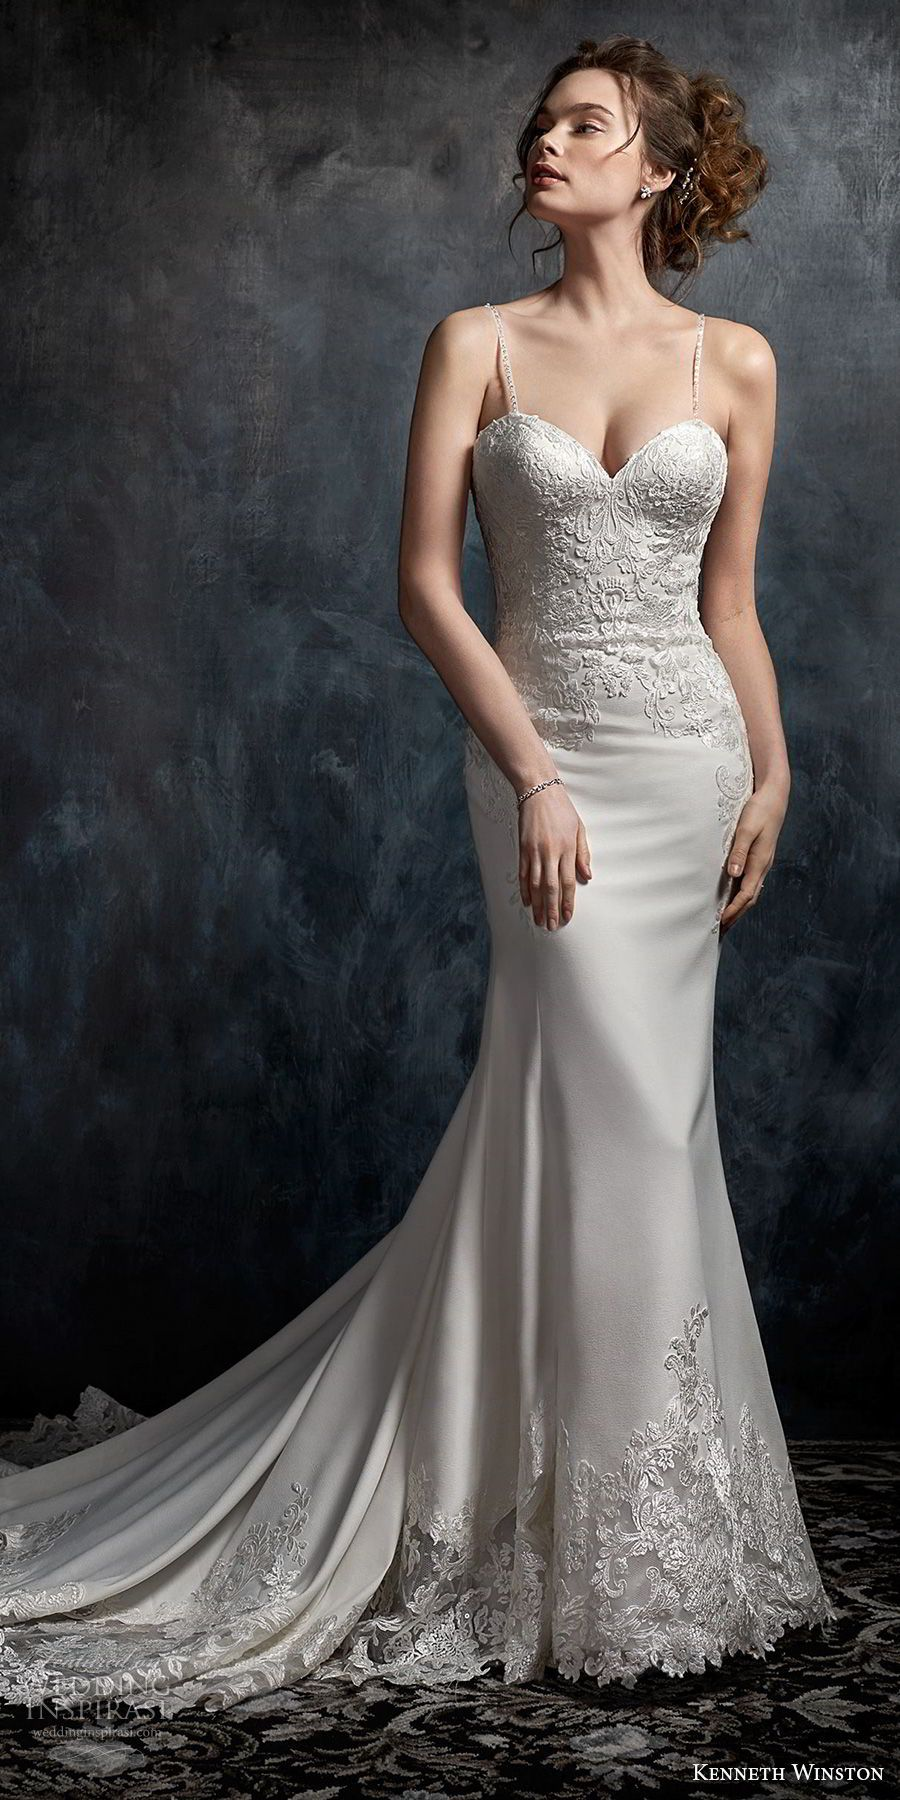 Kenneth Winston Fall 2017 Wedding Dresses   Chapel train, Bodice and ...